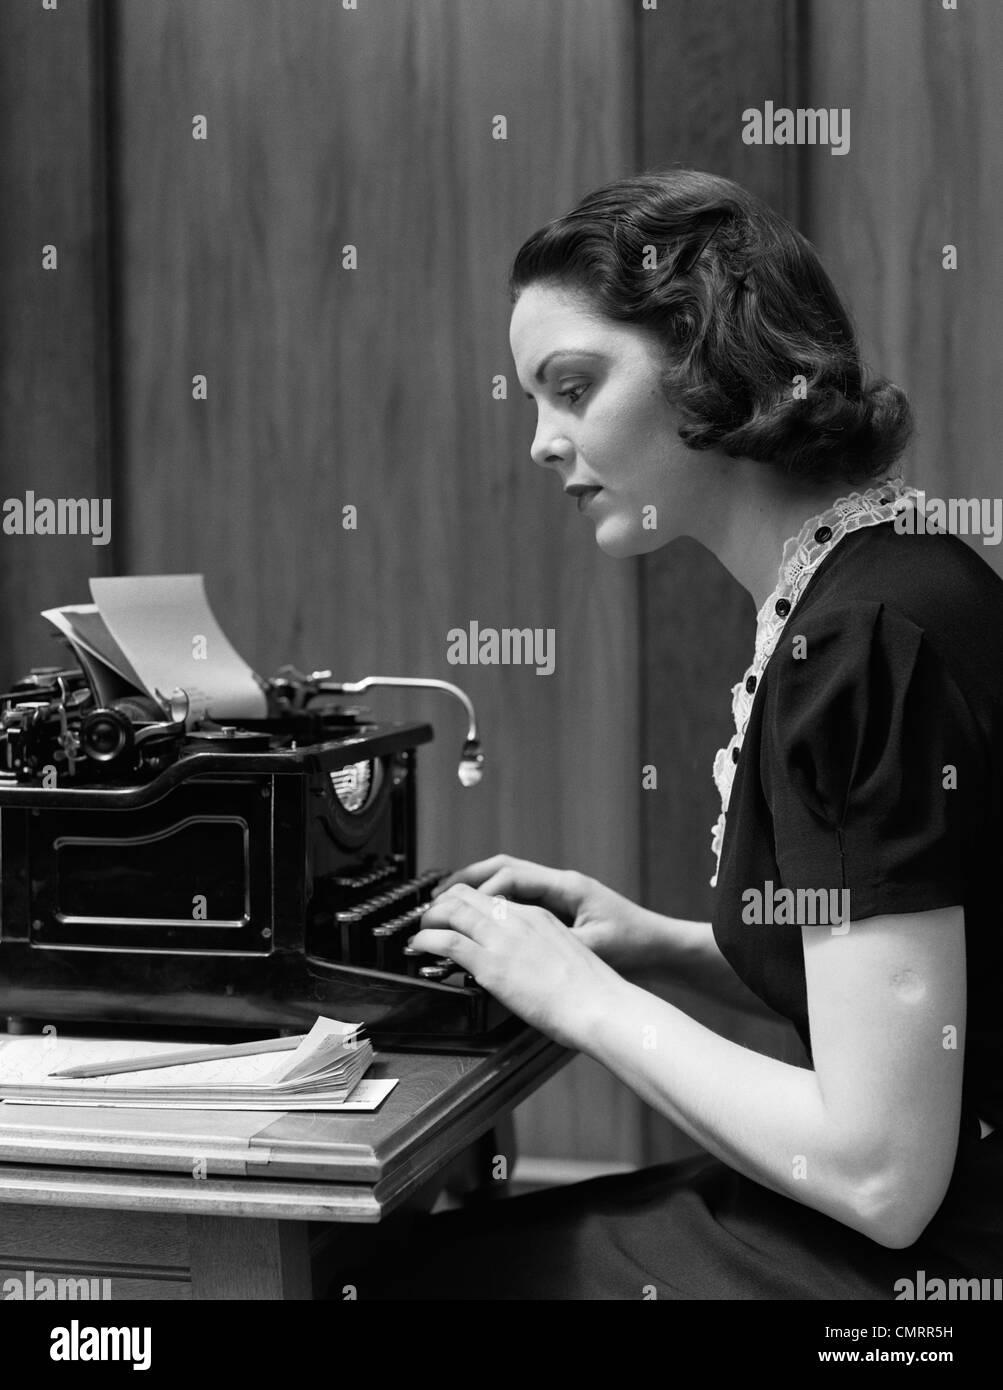 1930s WOMAN TYPING ON UNDERWOOD TYPEWRITER Stock Photo ...